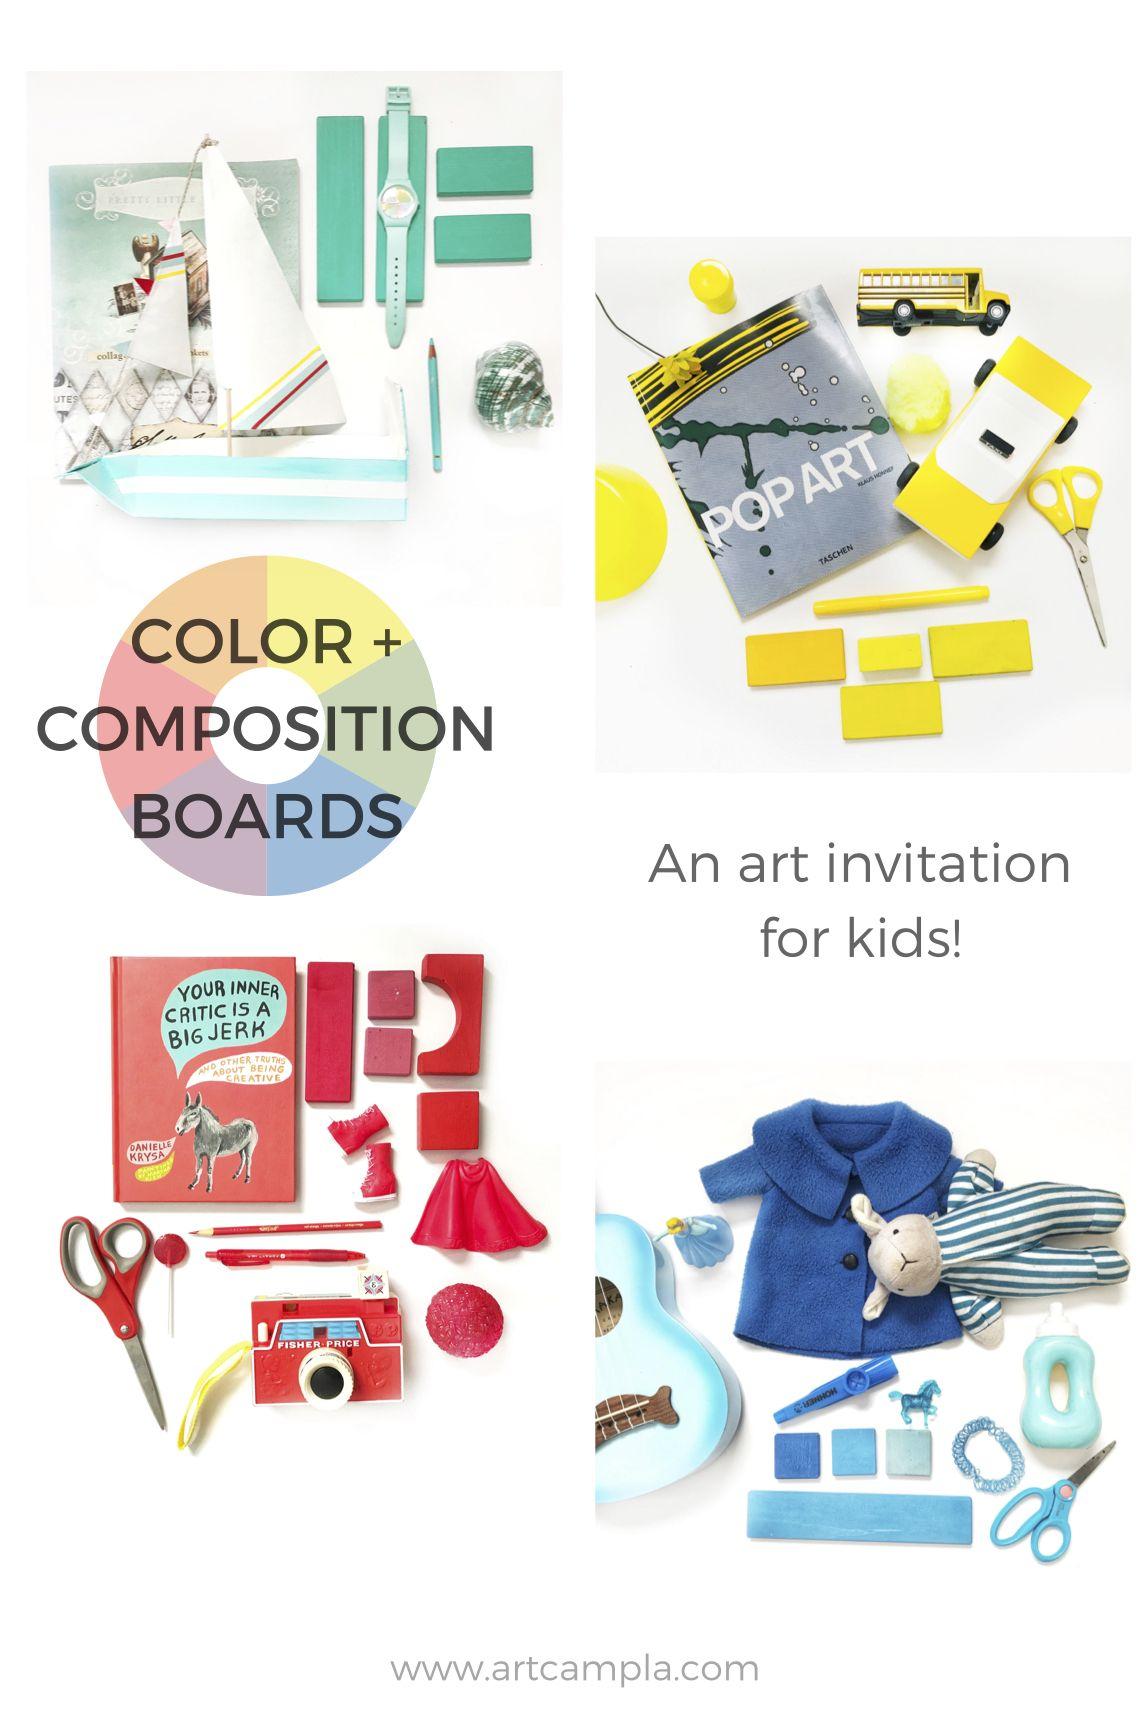 Art invitation color composition boards art camp blog art invitation for kids color composition boards elements of composition art ed stopboris Images